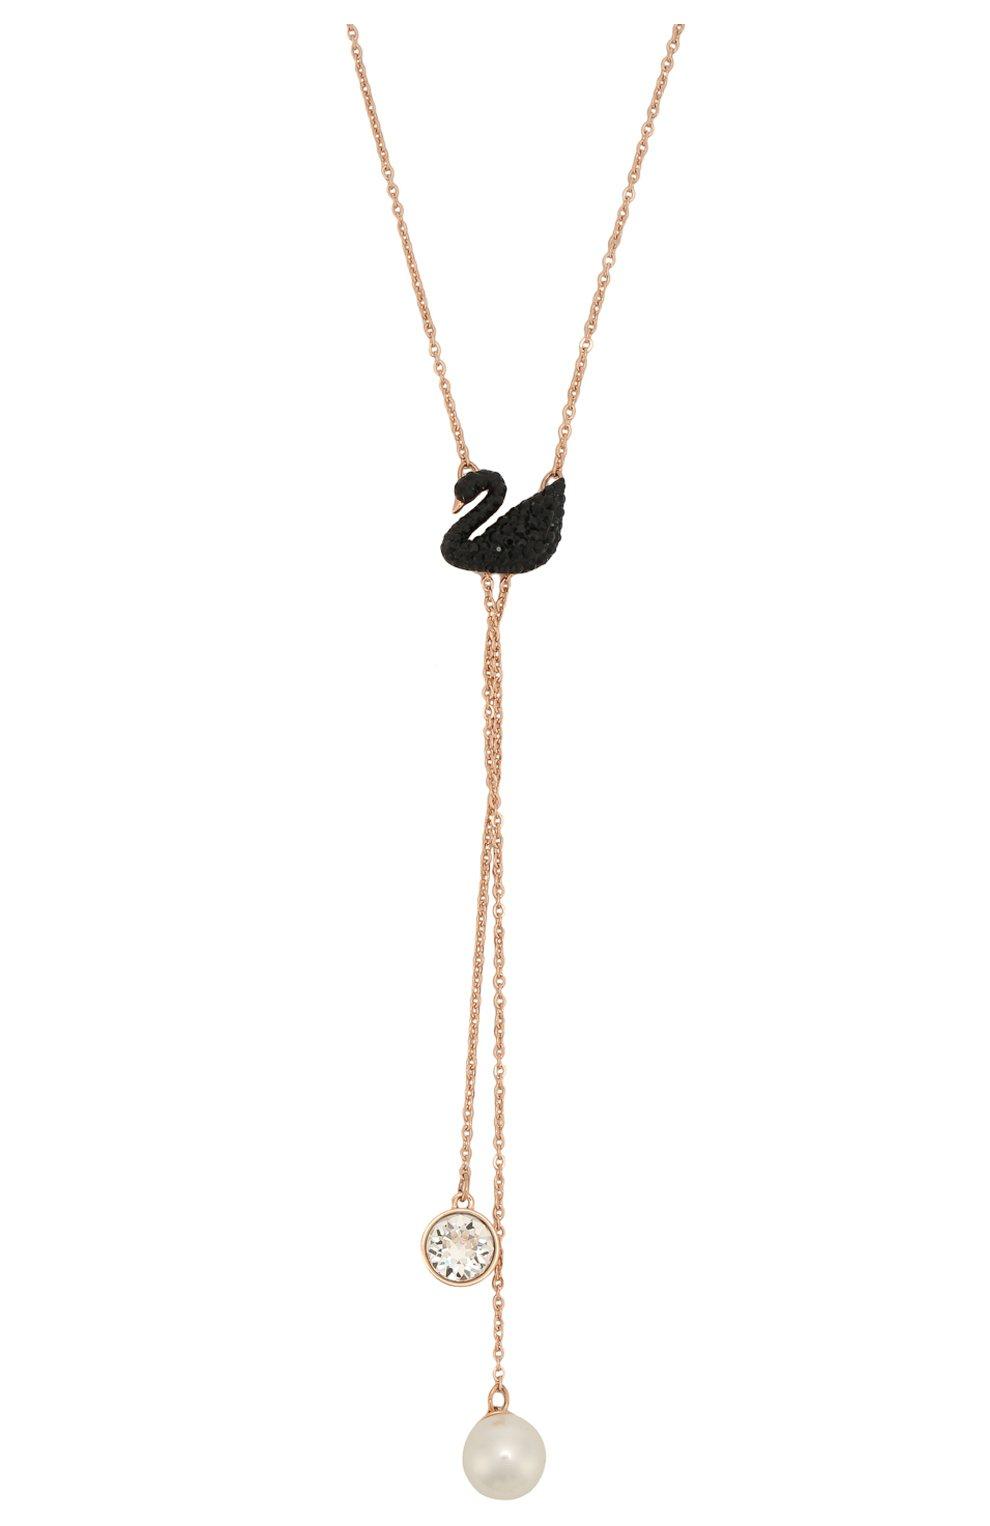 Женское ожерелье iconic swan double y SWAROVSKI золотого цвета, арт. 5351806 | Фото 2